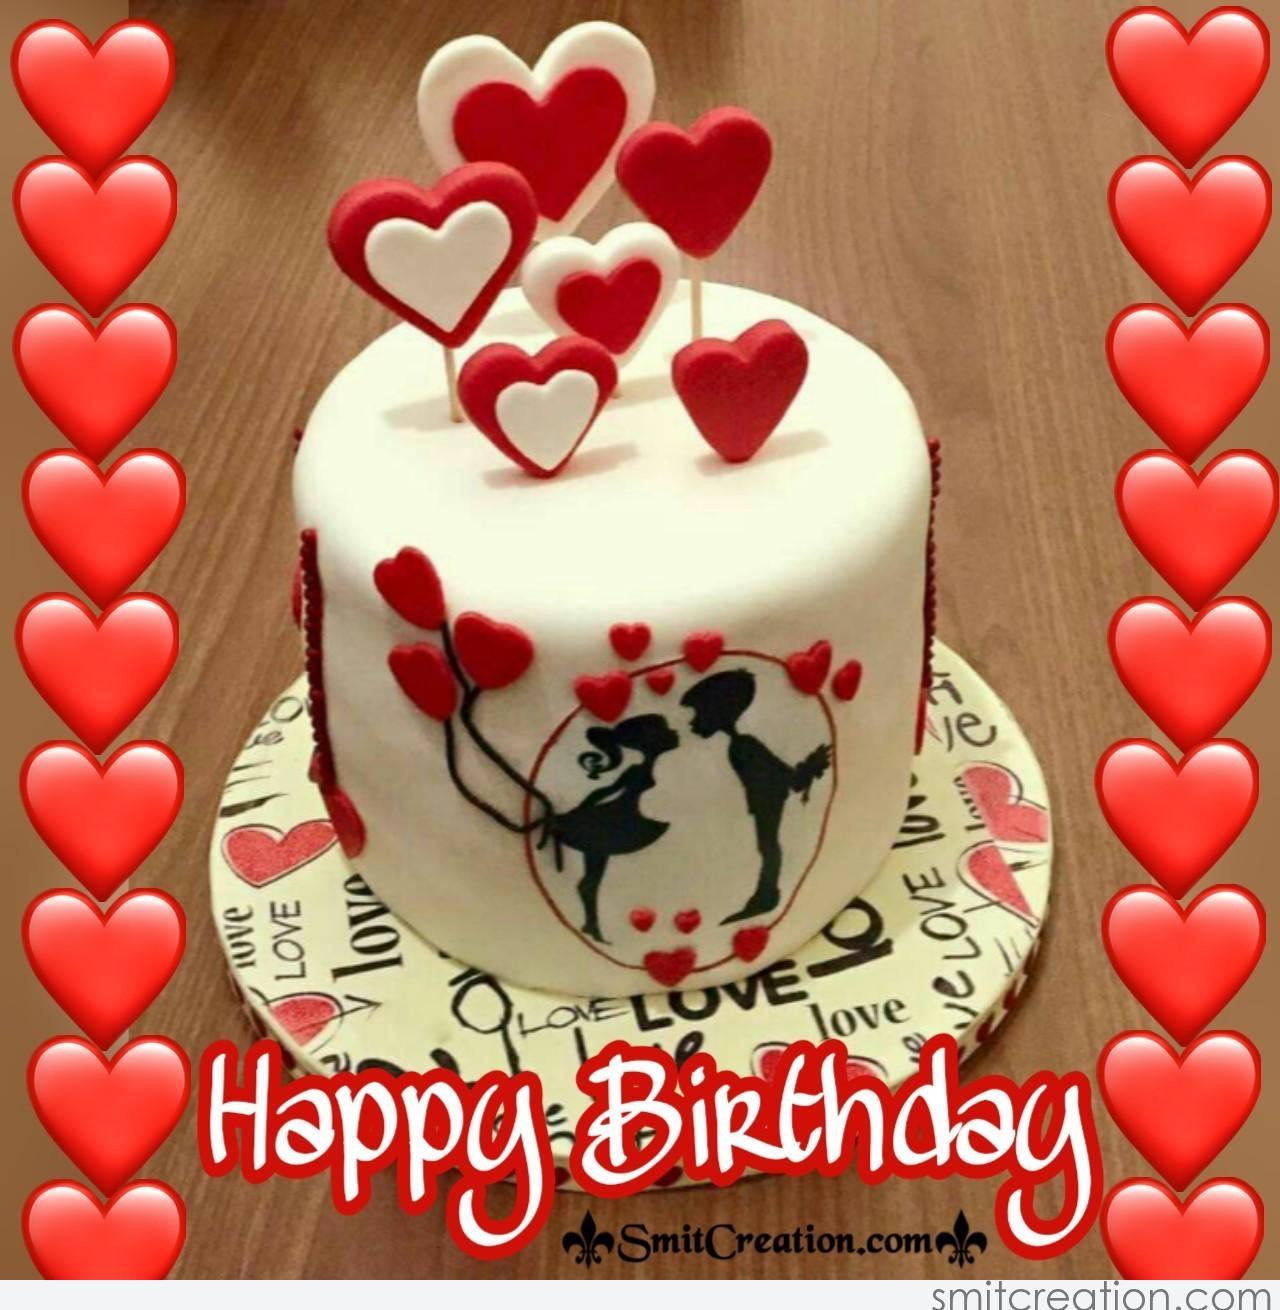 Happy Birthday Cake With Love Smitcreation Com